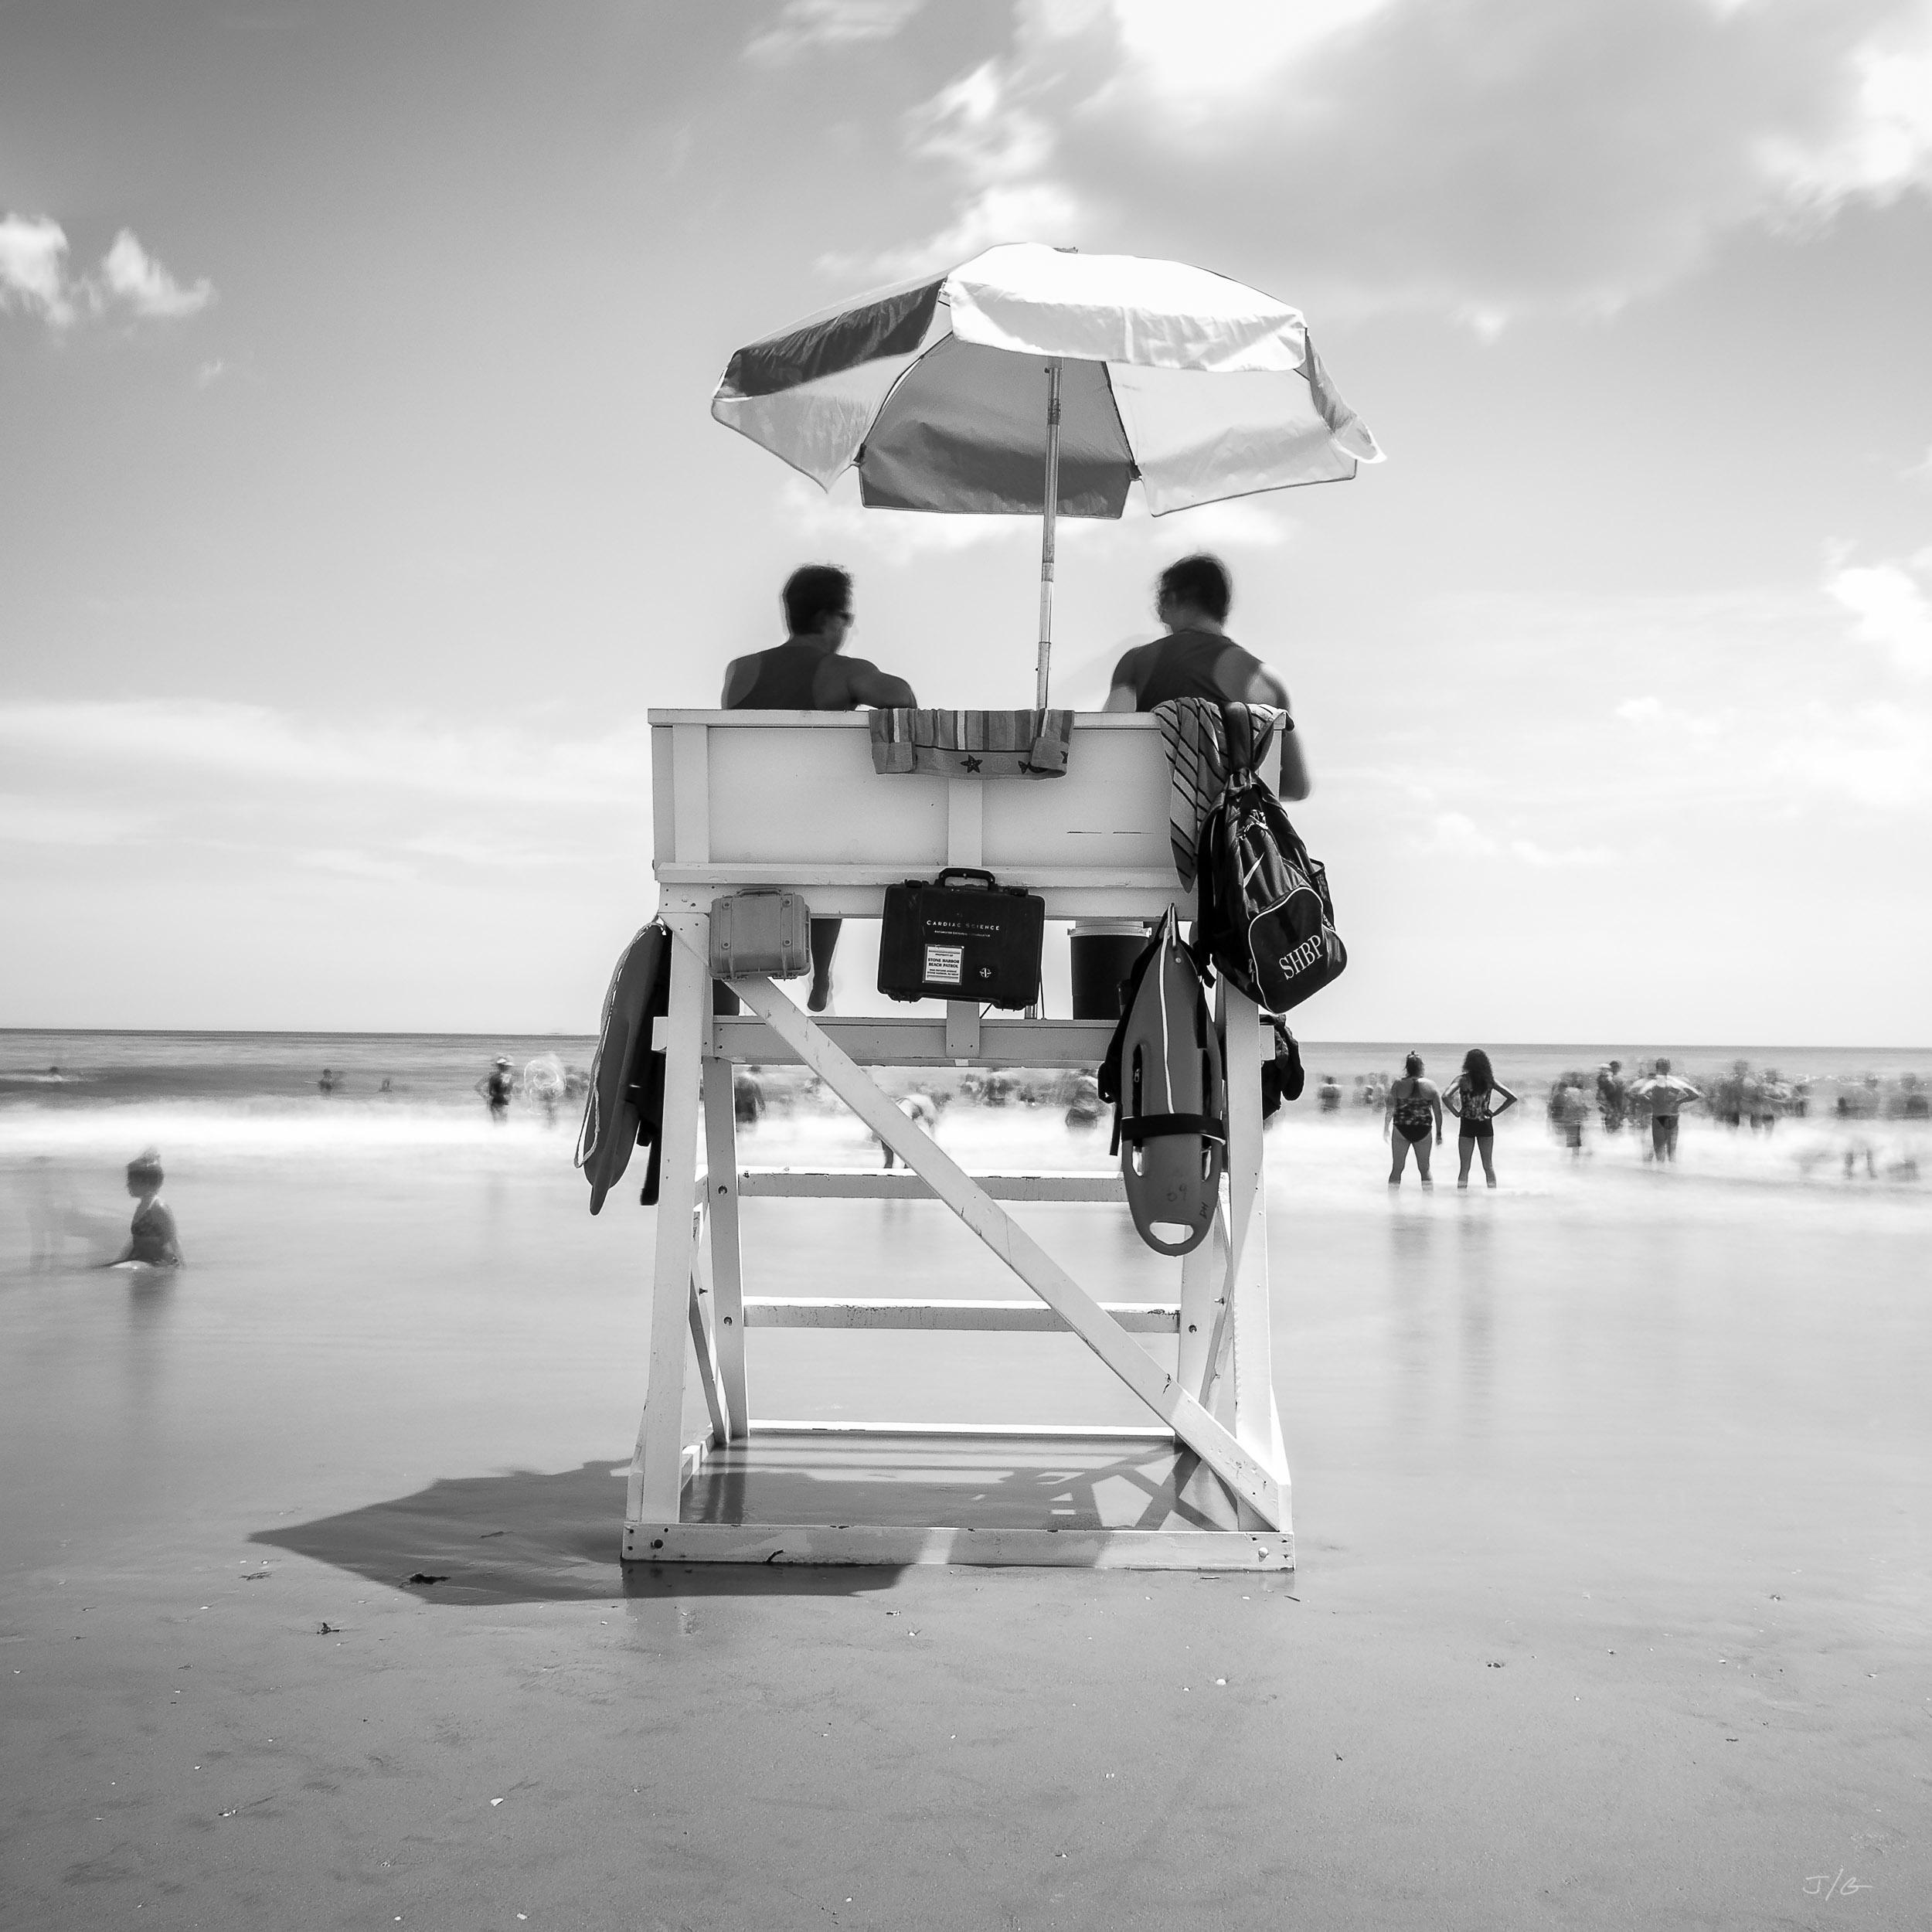 Beach Patrol - Stone Harbor, NJ - ©John Guillaume